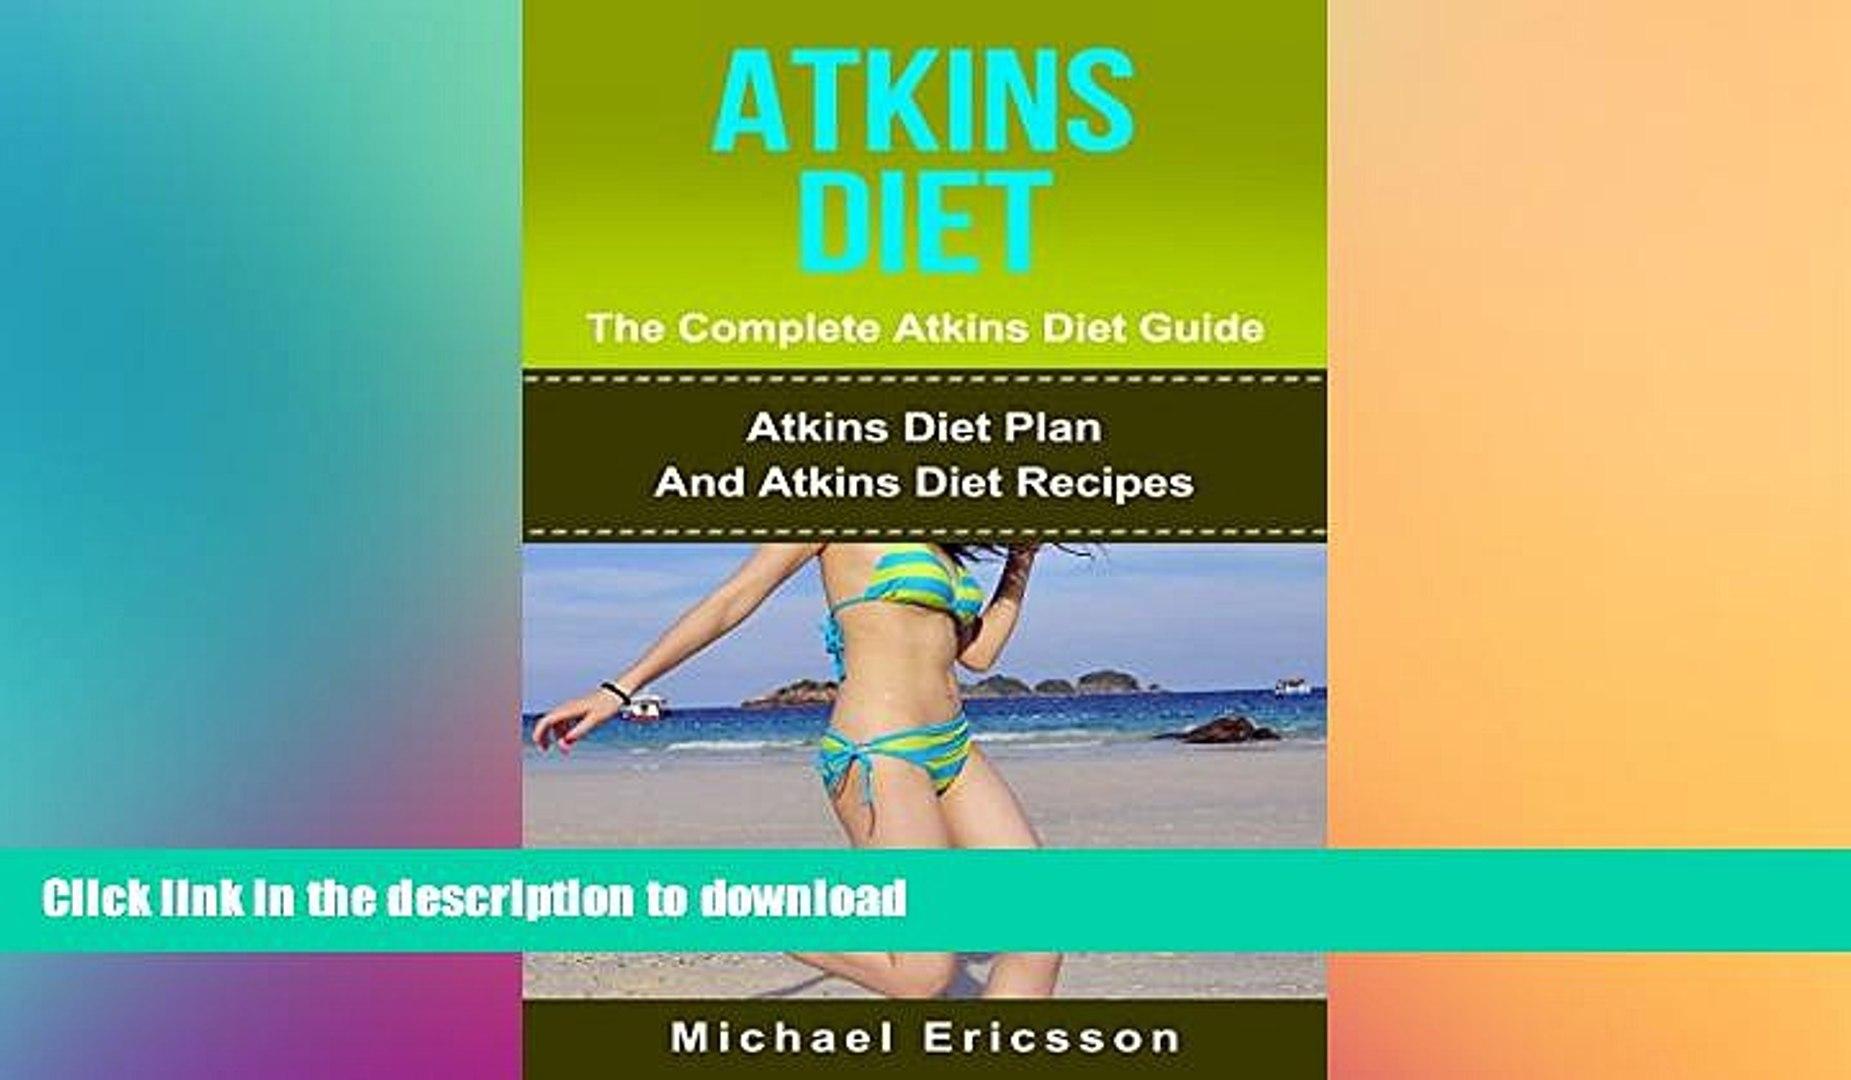 READ  ATKINS DIET: The Complete Atkins Diet Guide: Atkins Diet Plan And Atkins Diet Recipes To